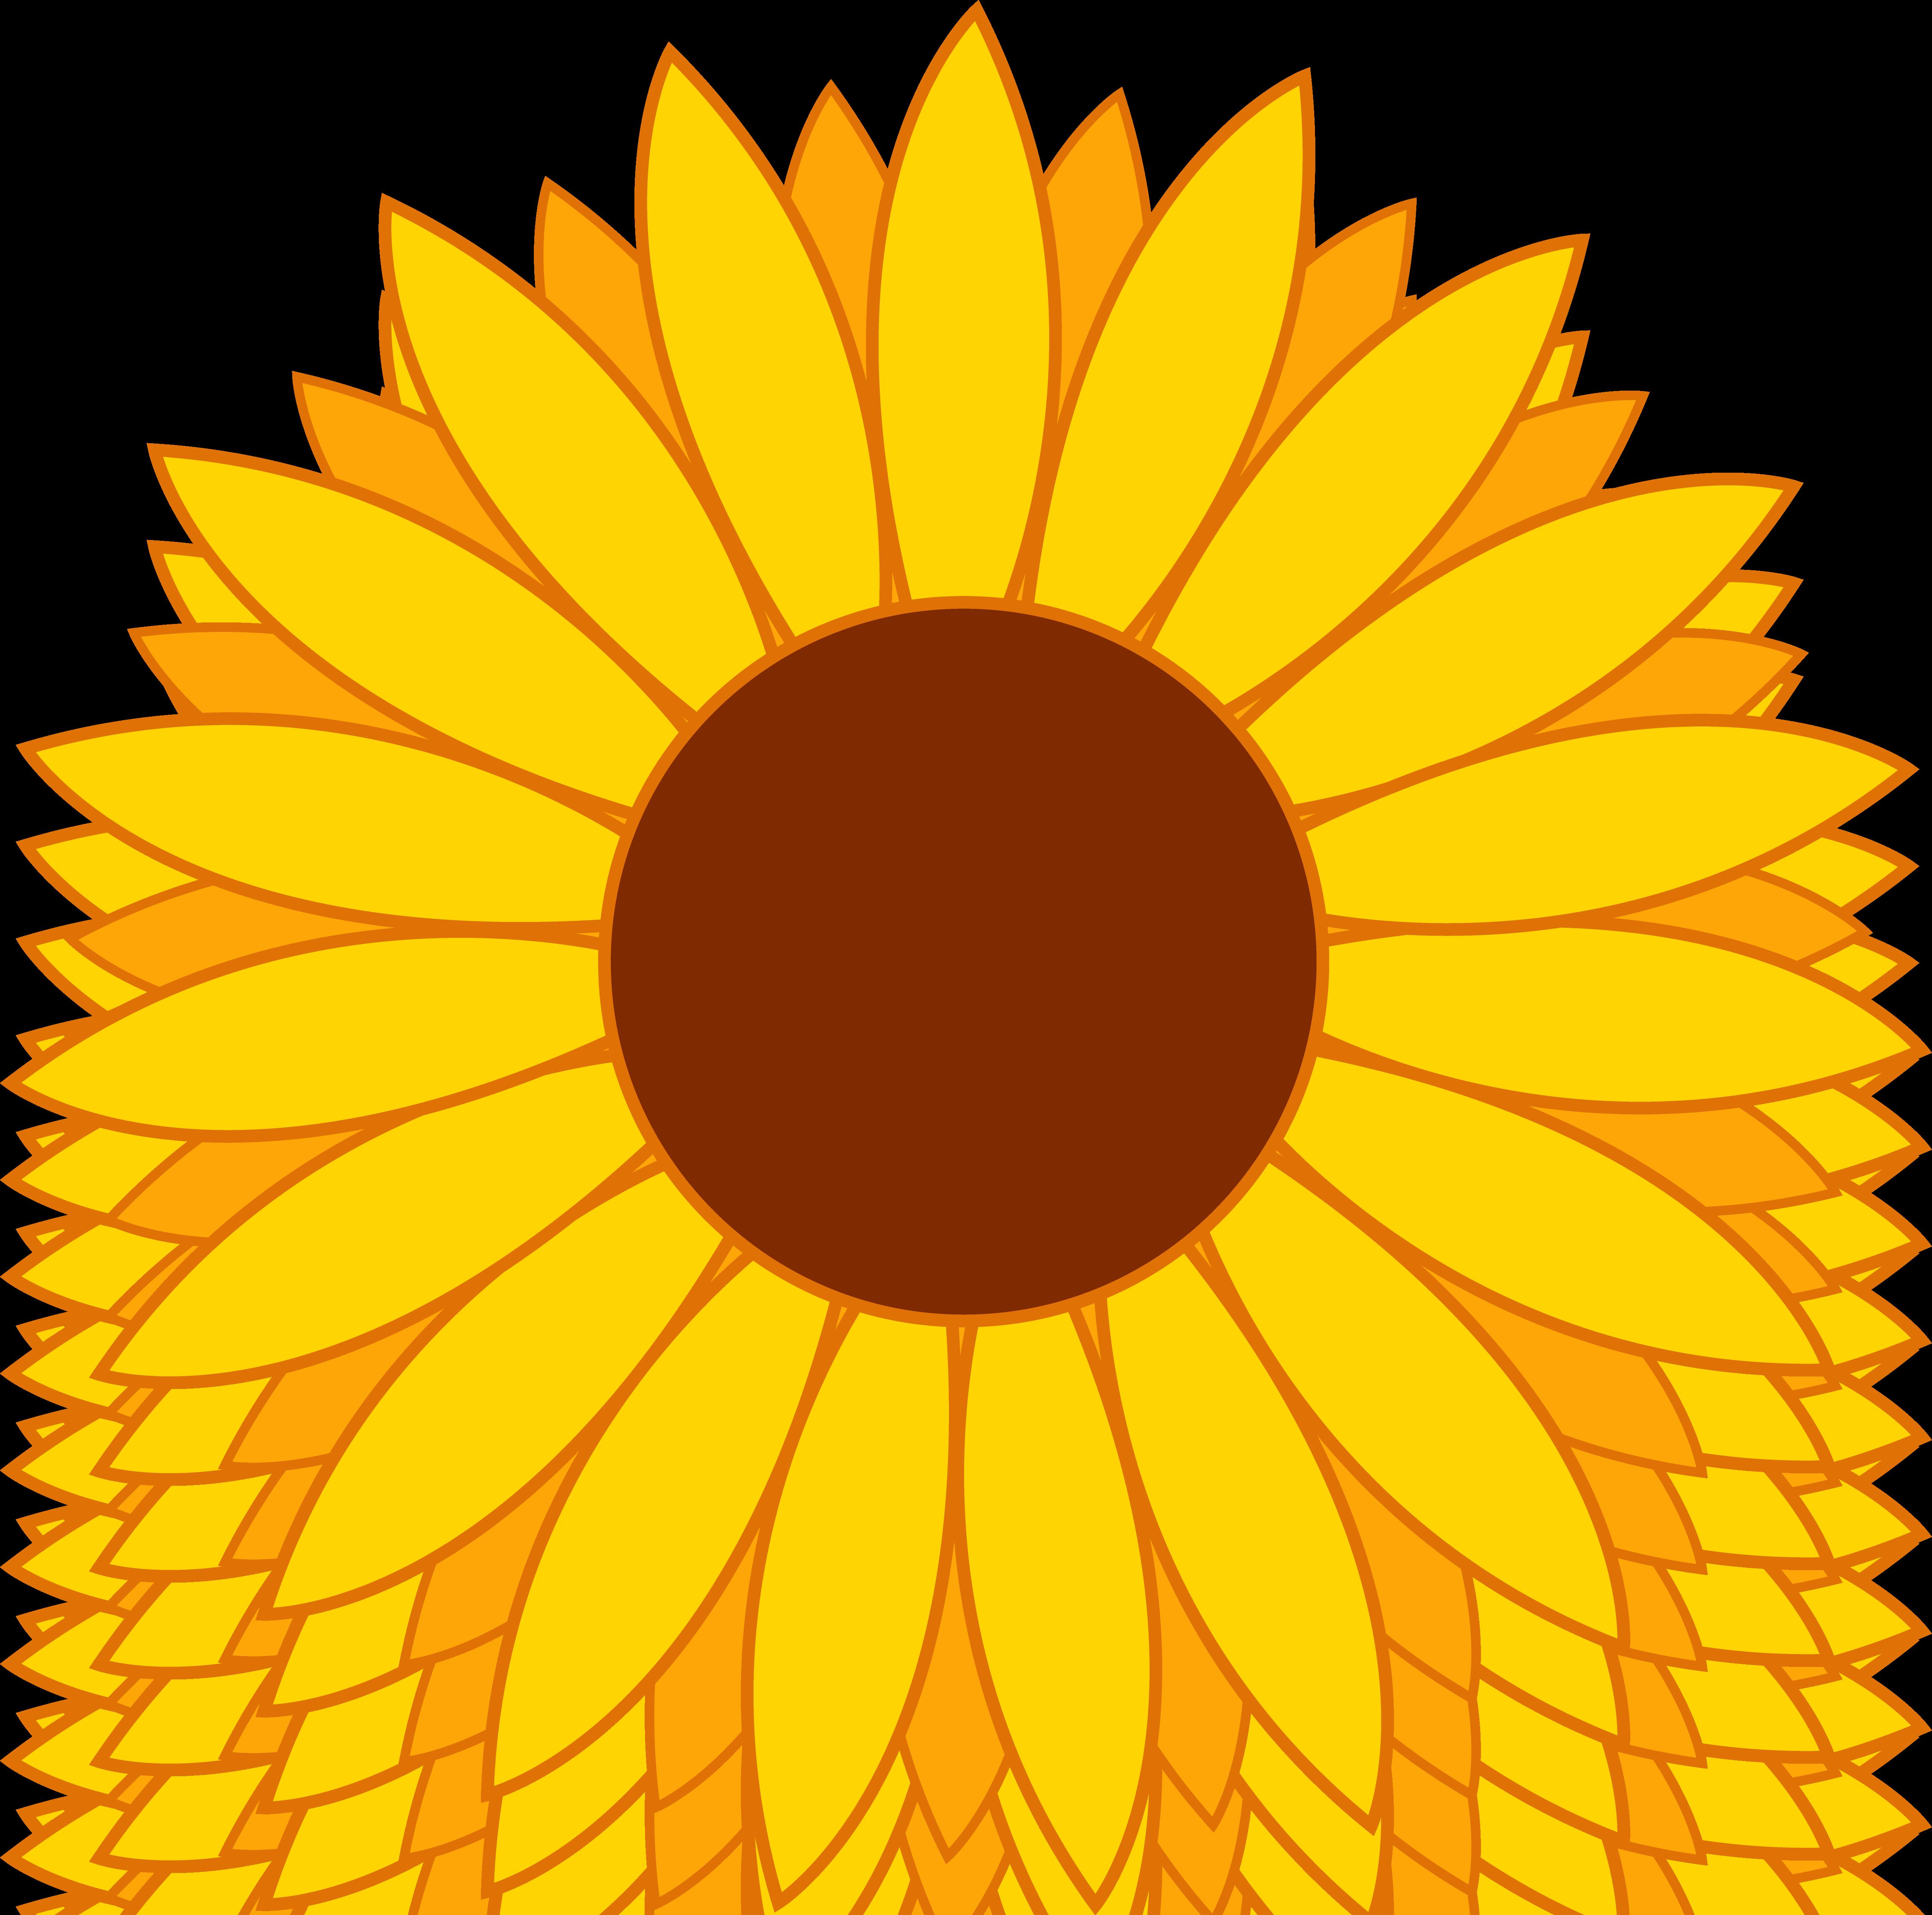 5110x5064 Sunflower Clip Art Free Printable Clipart 3